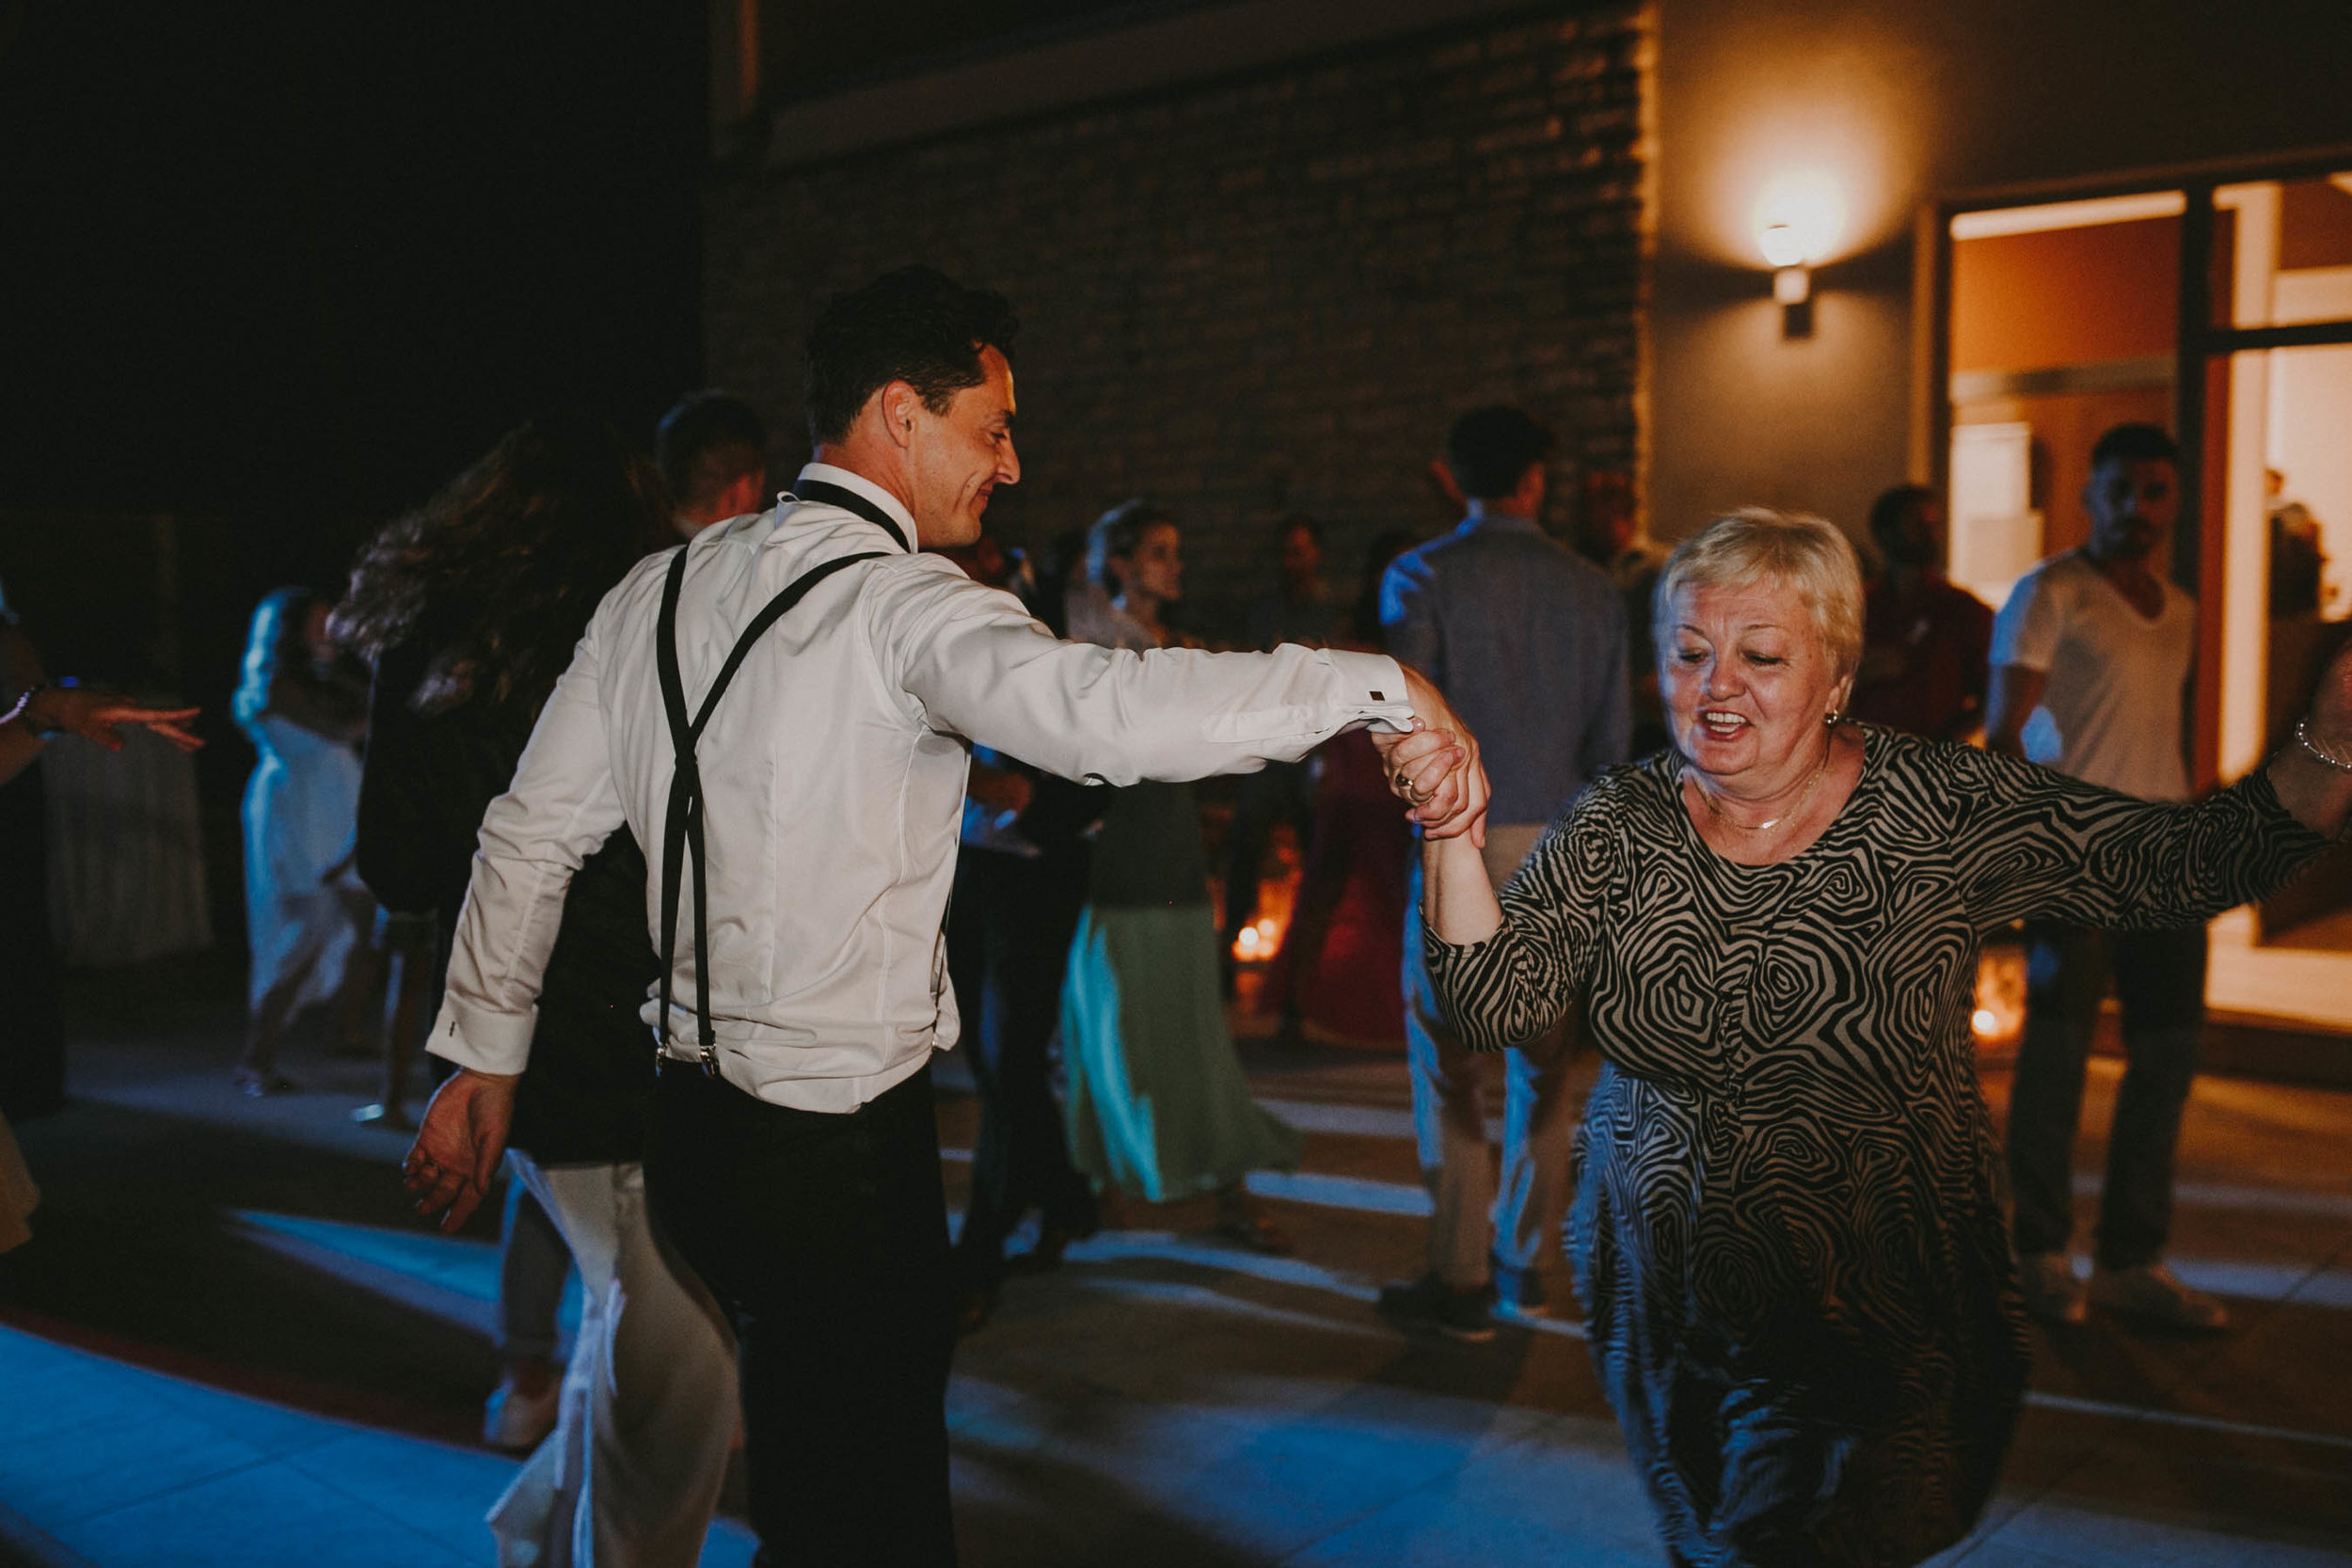 sylvia&dimitri-Wedding-Crvena_Luka-Croatia-123(0188).jpg